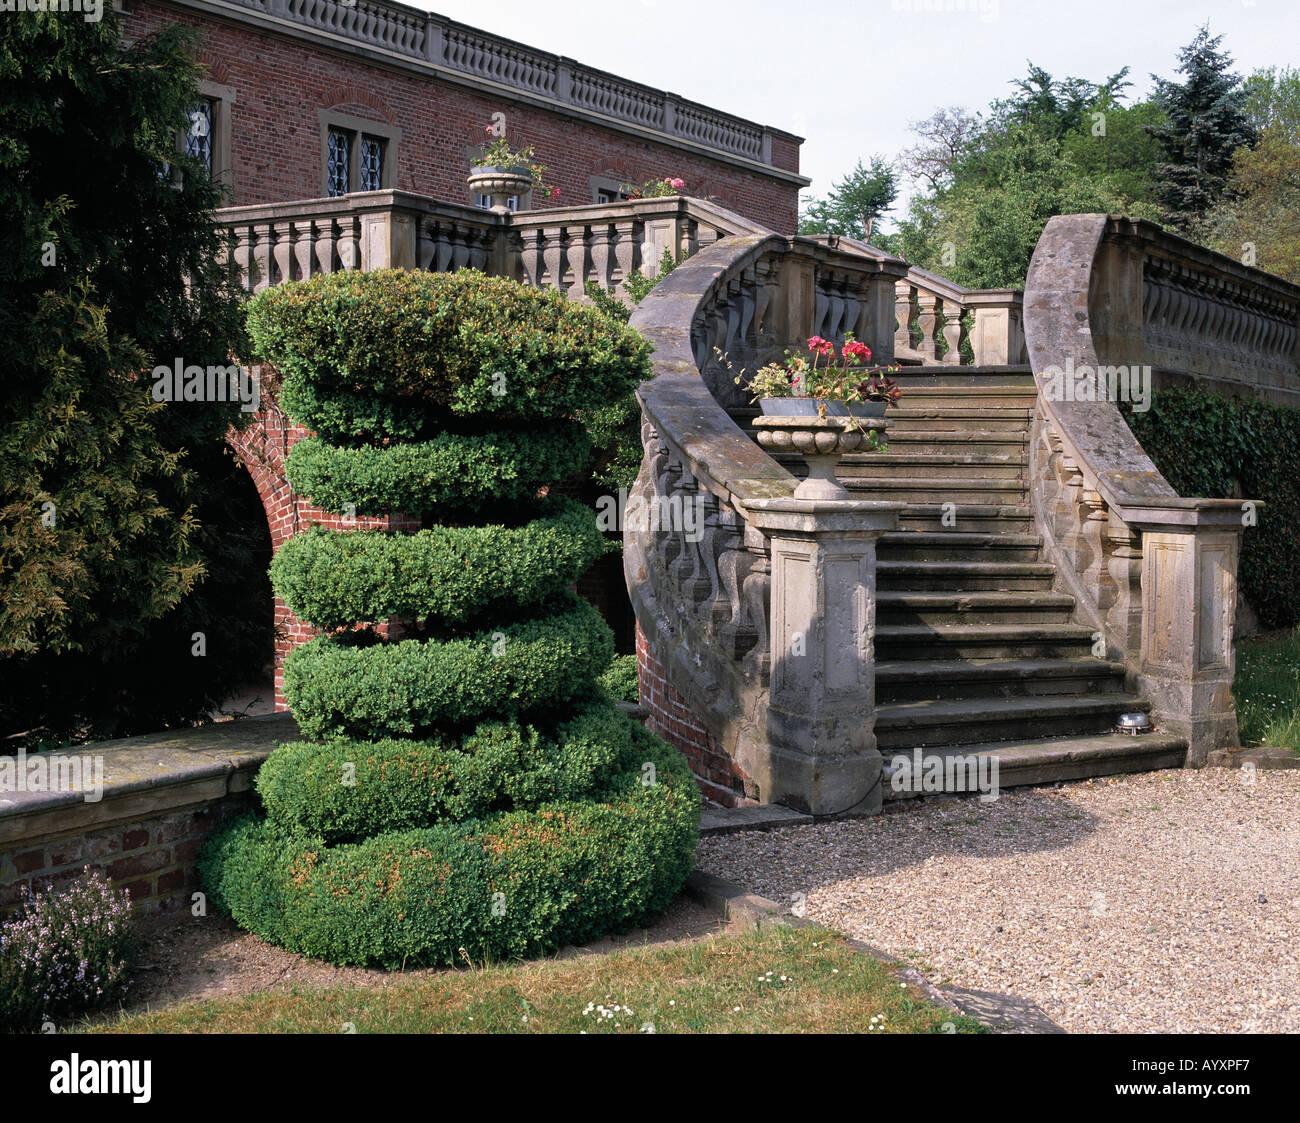 barocke treppe zierbusch italienischer garten am schloss kalbeck in stockfoto lizenzfreies. Black Bedroom Furniture Sets. Home Design Ideas